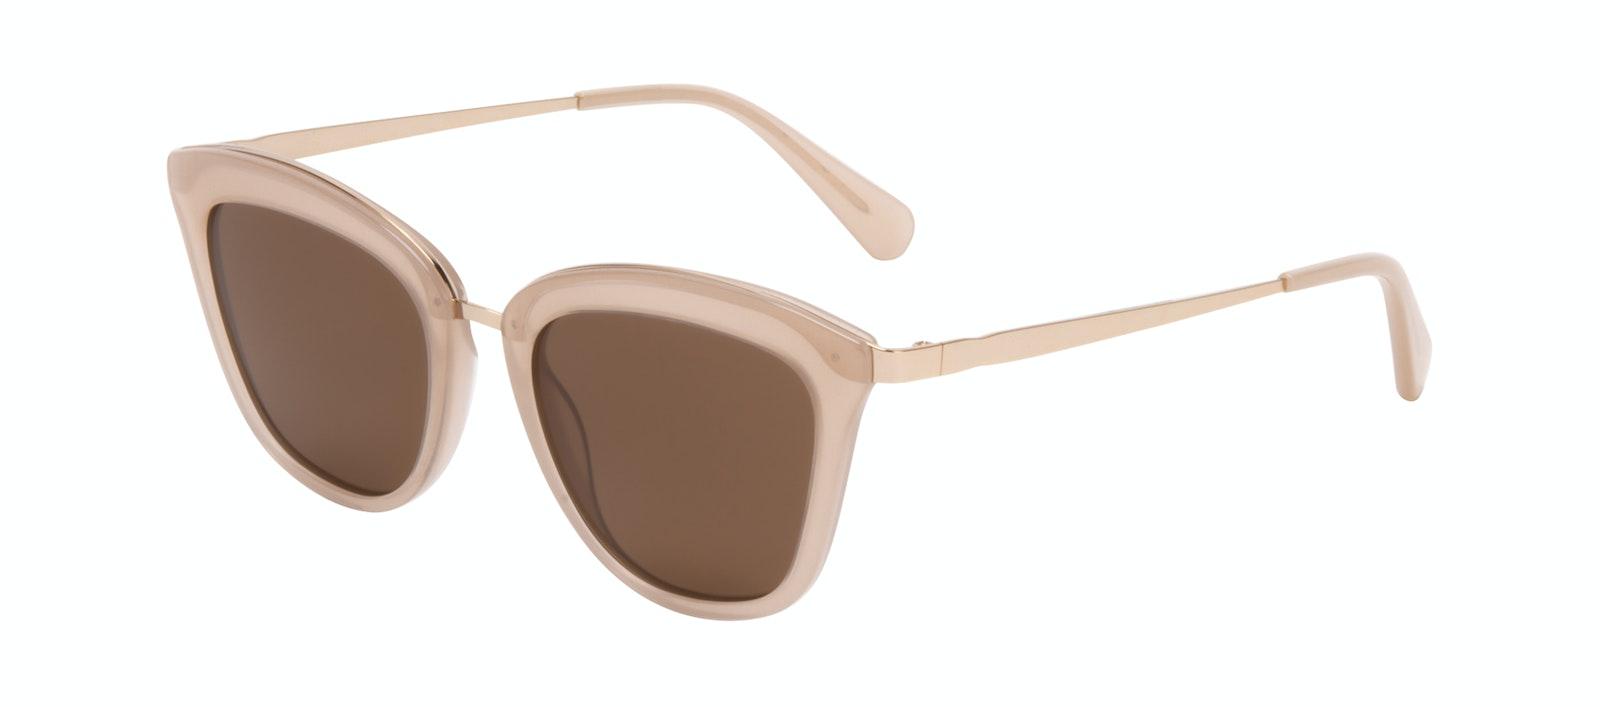 Affordable Fashion Glasses Cat Eye Sunglasses Women More Petite Bone Tilt